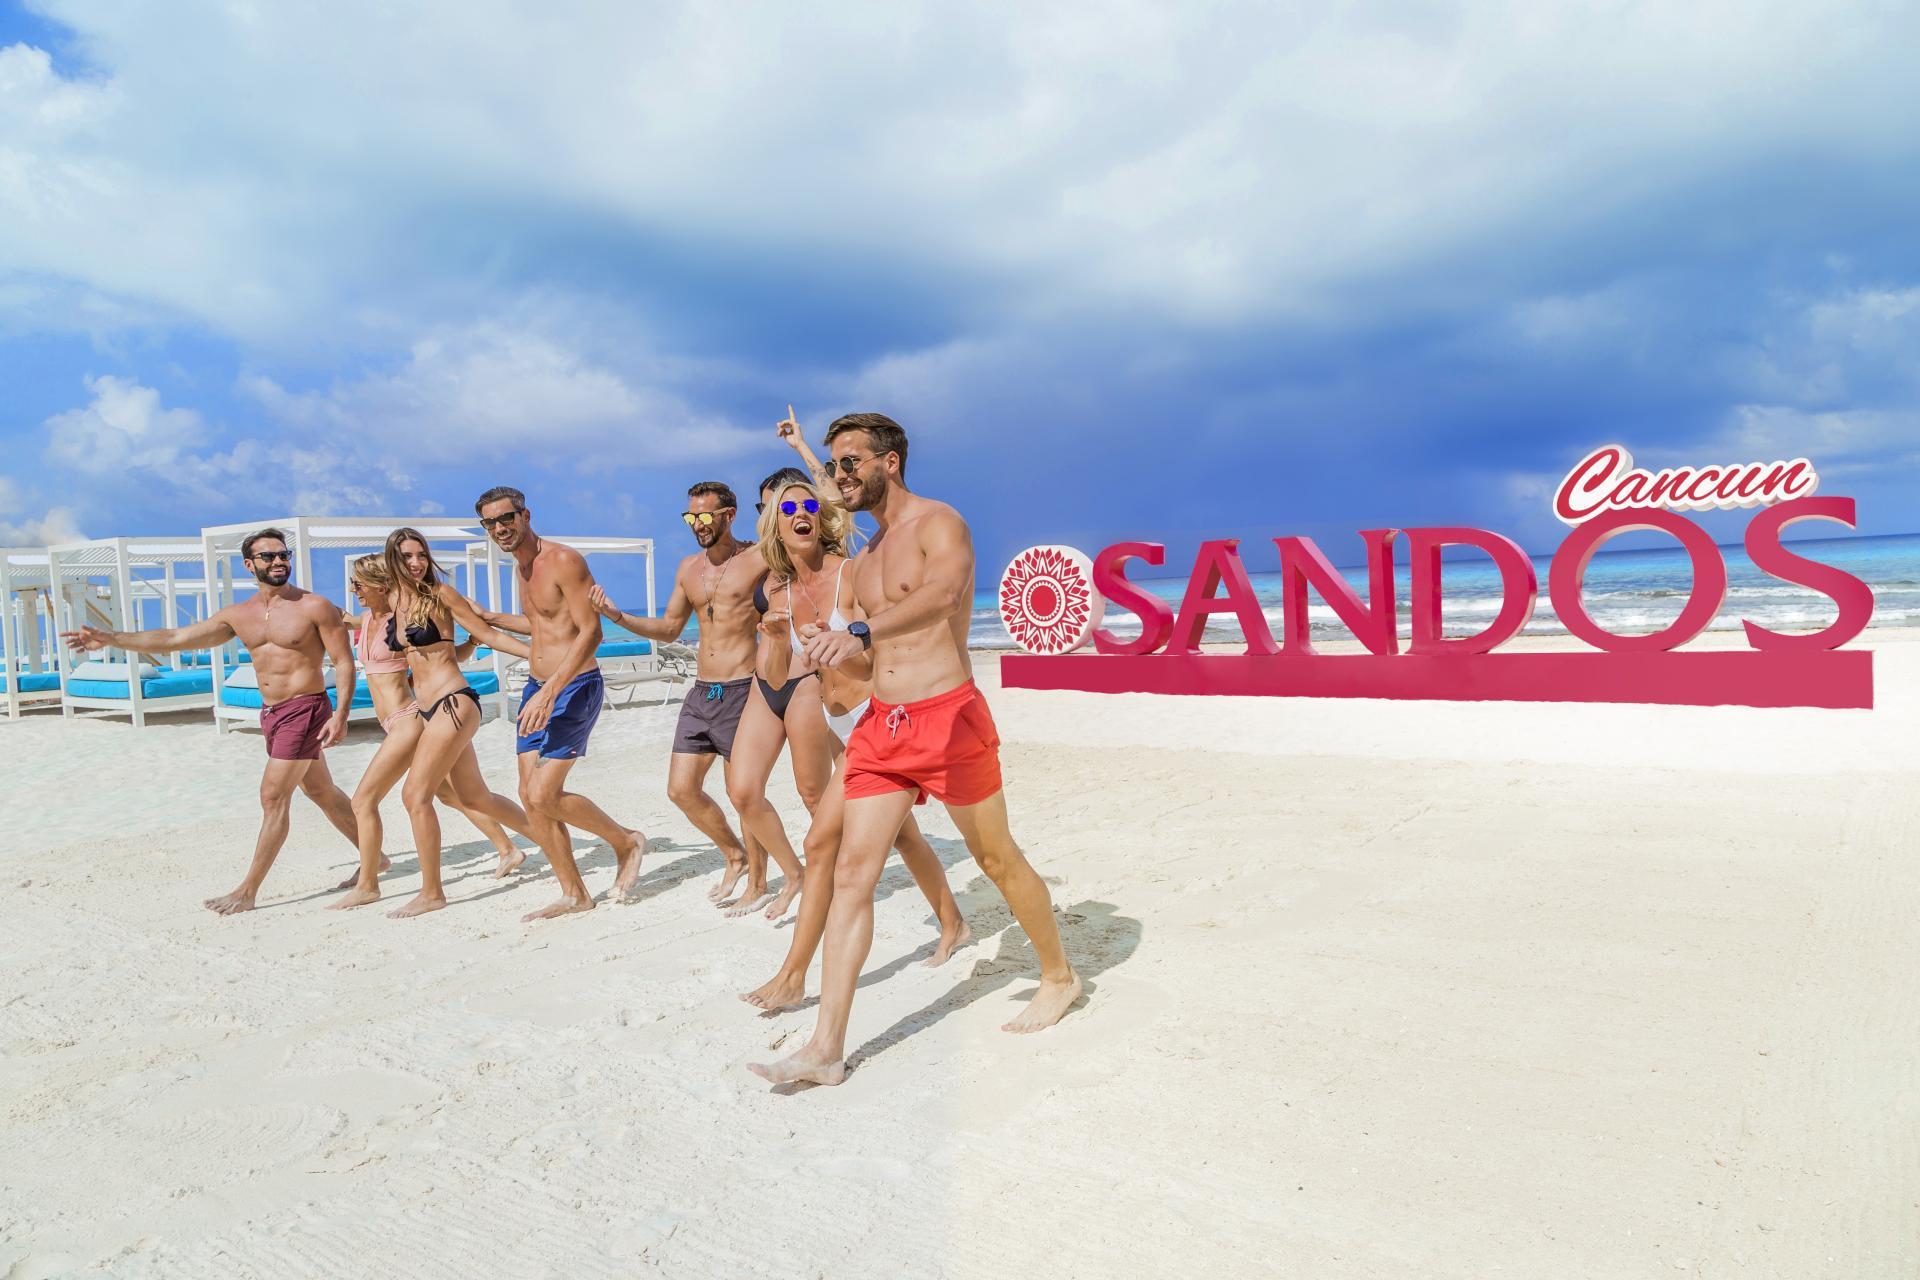 Sandos Cancun Cancun Mexico Resorts All Inclusive